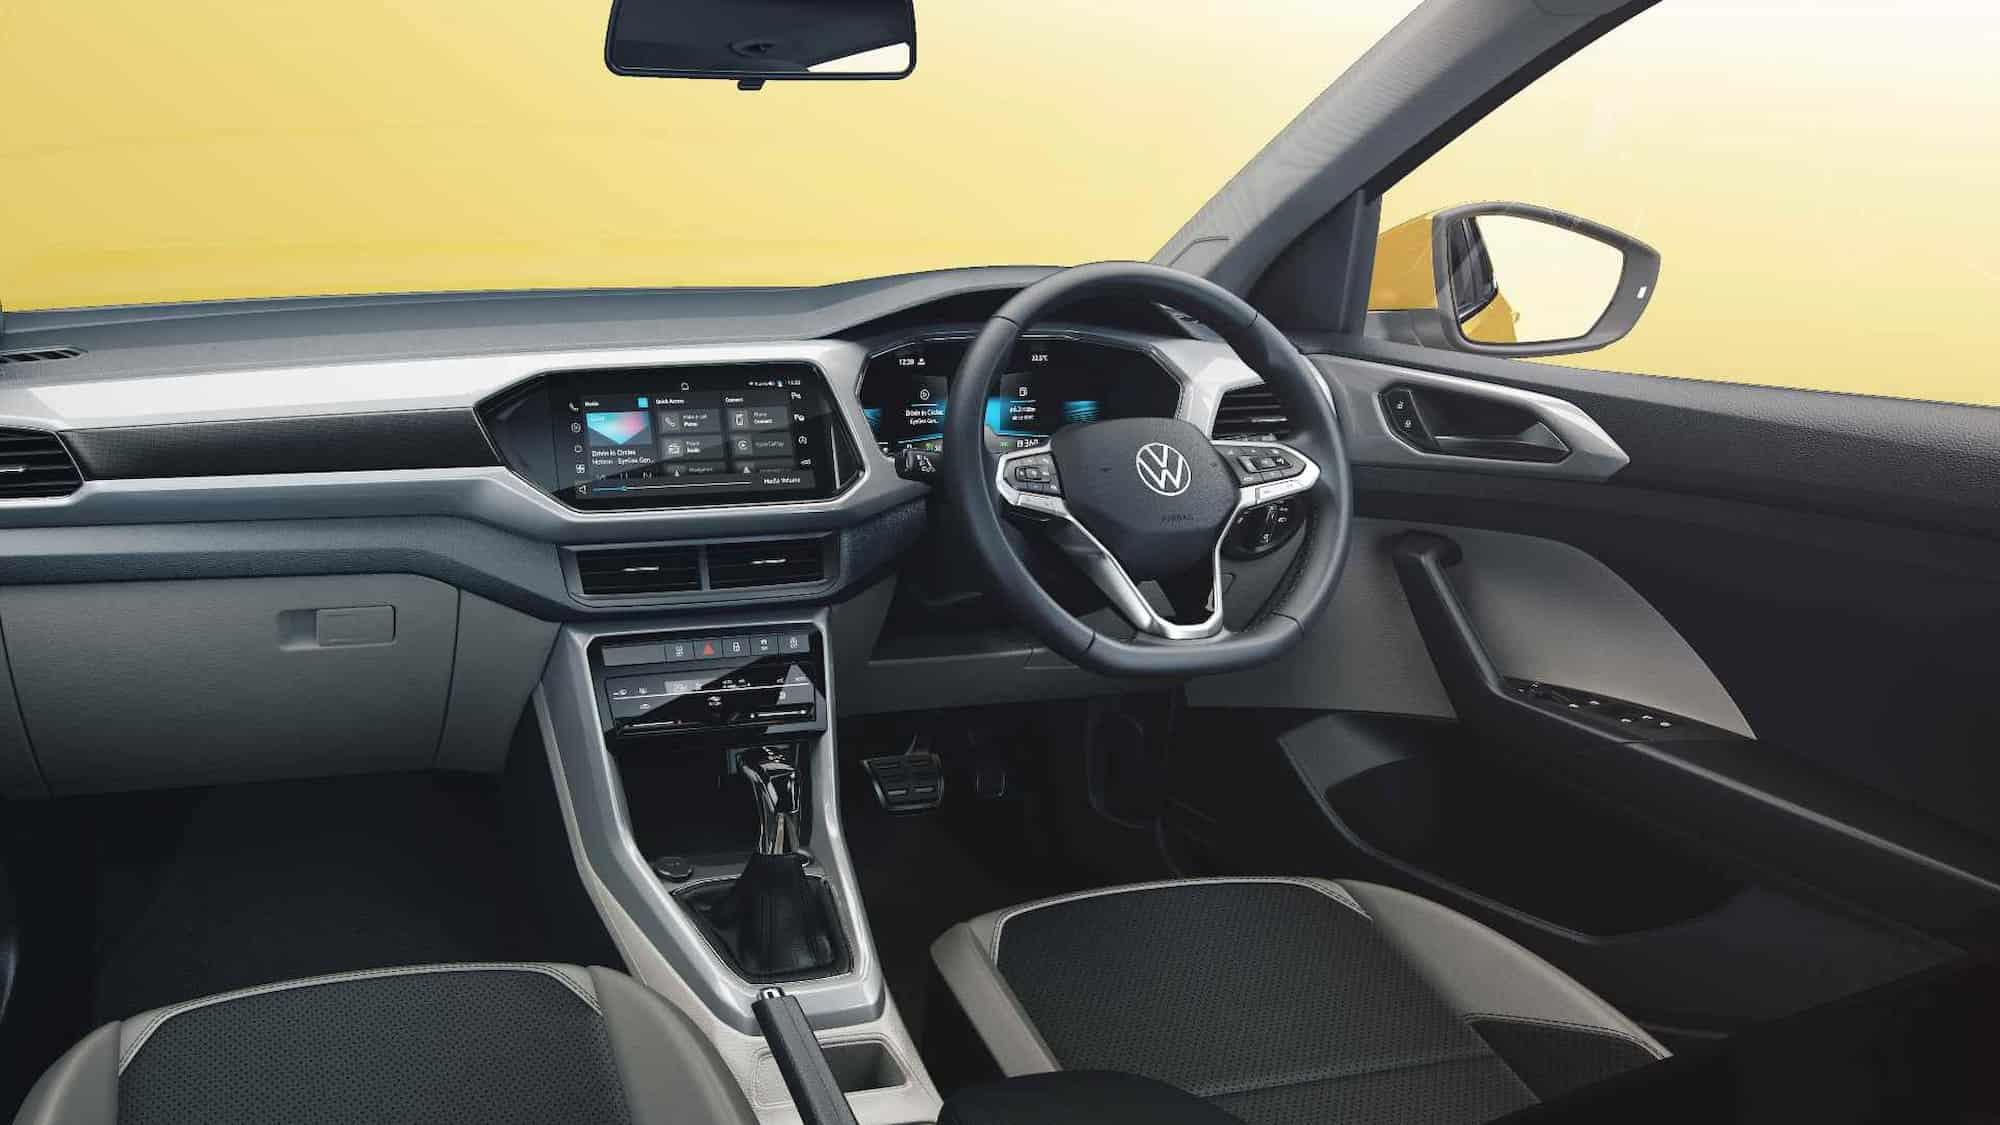 volkswagen taigun interior revealed ahead of launch 1